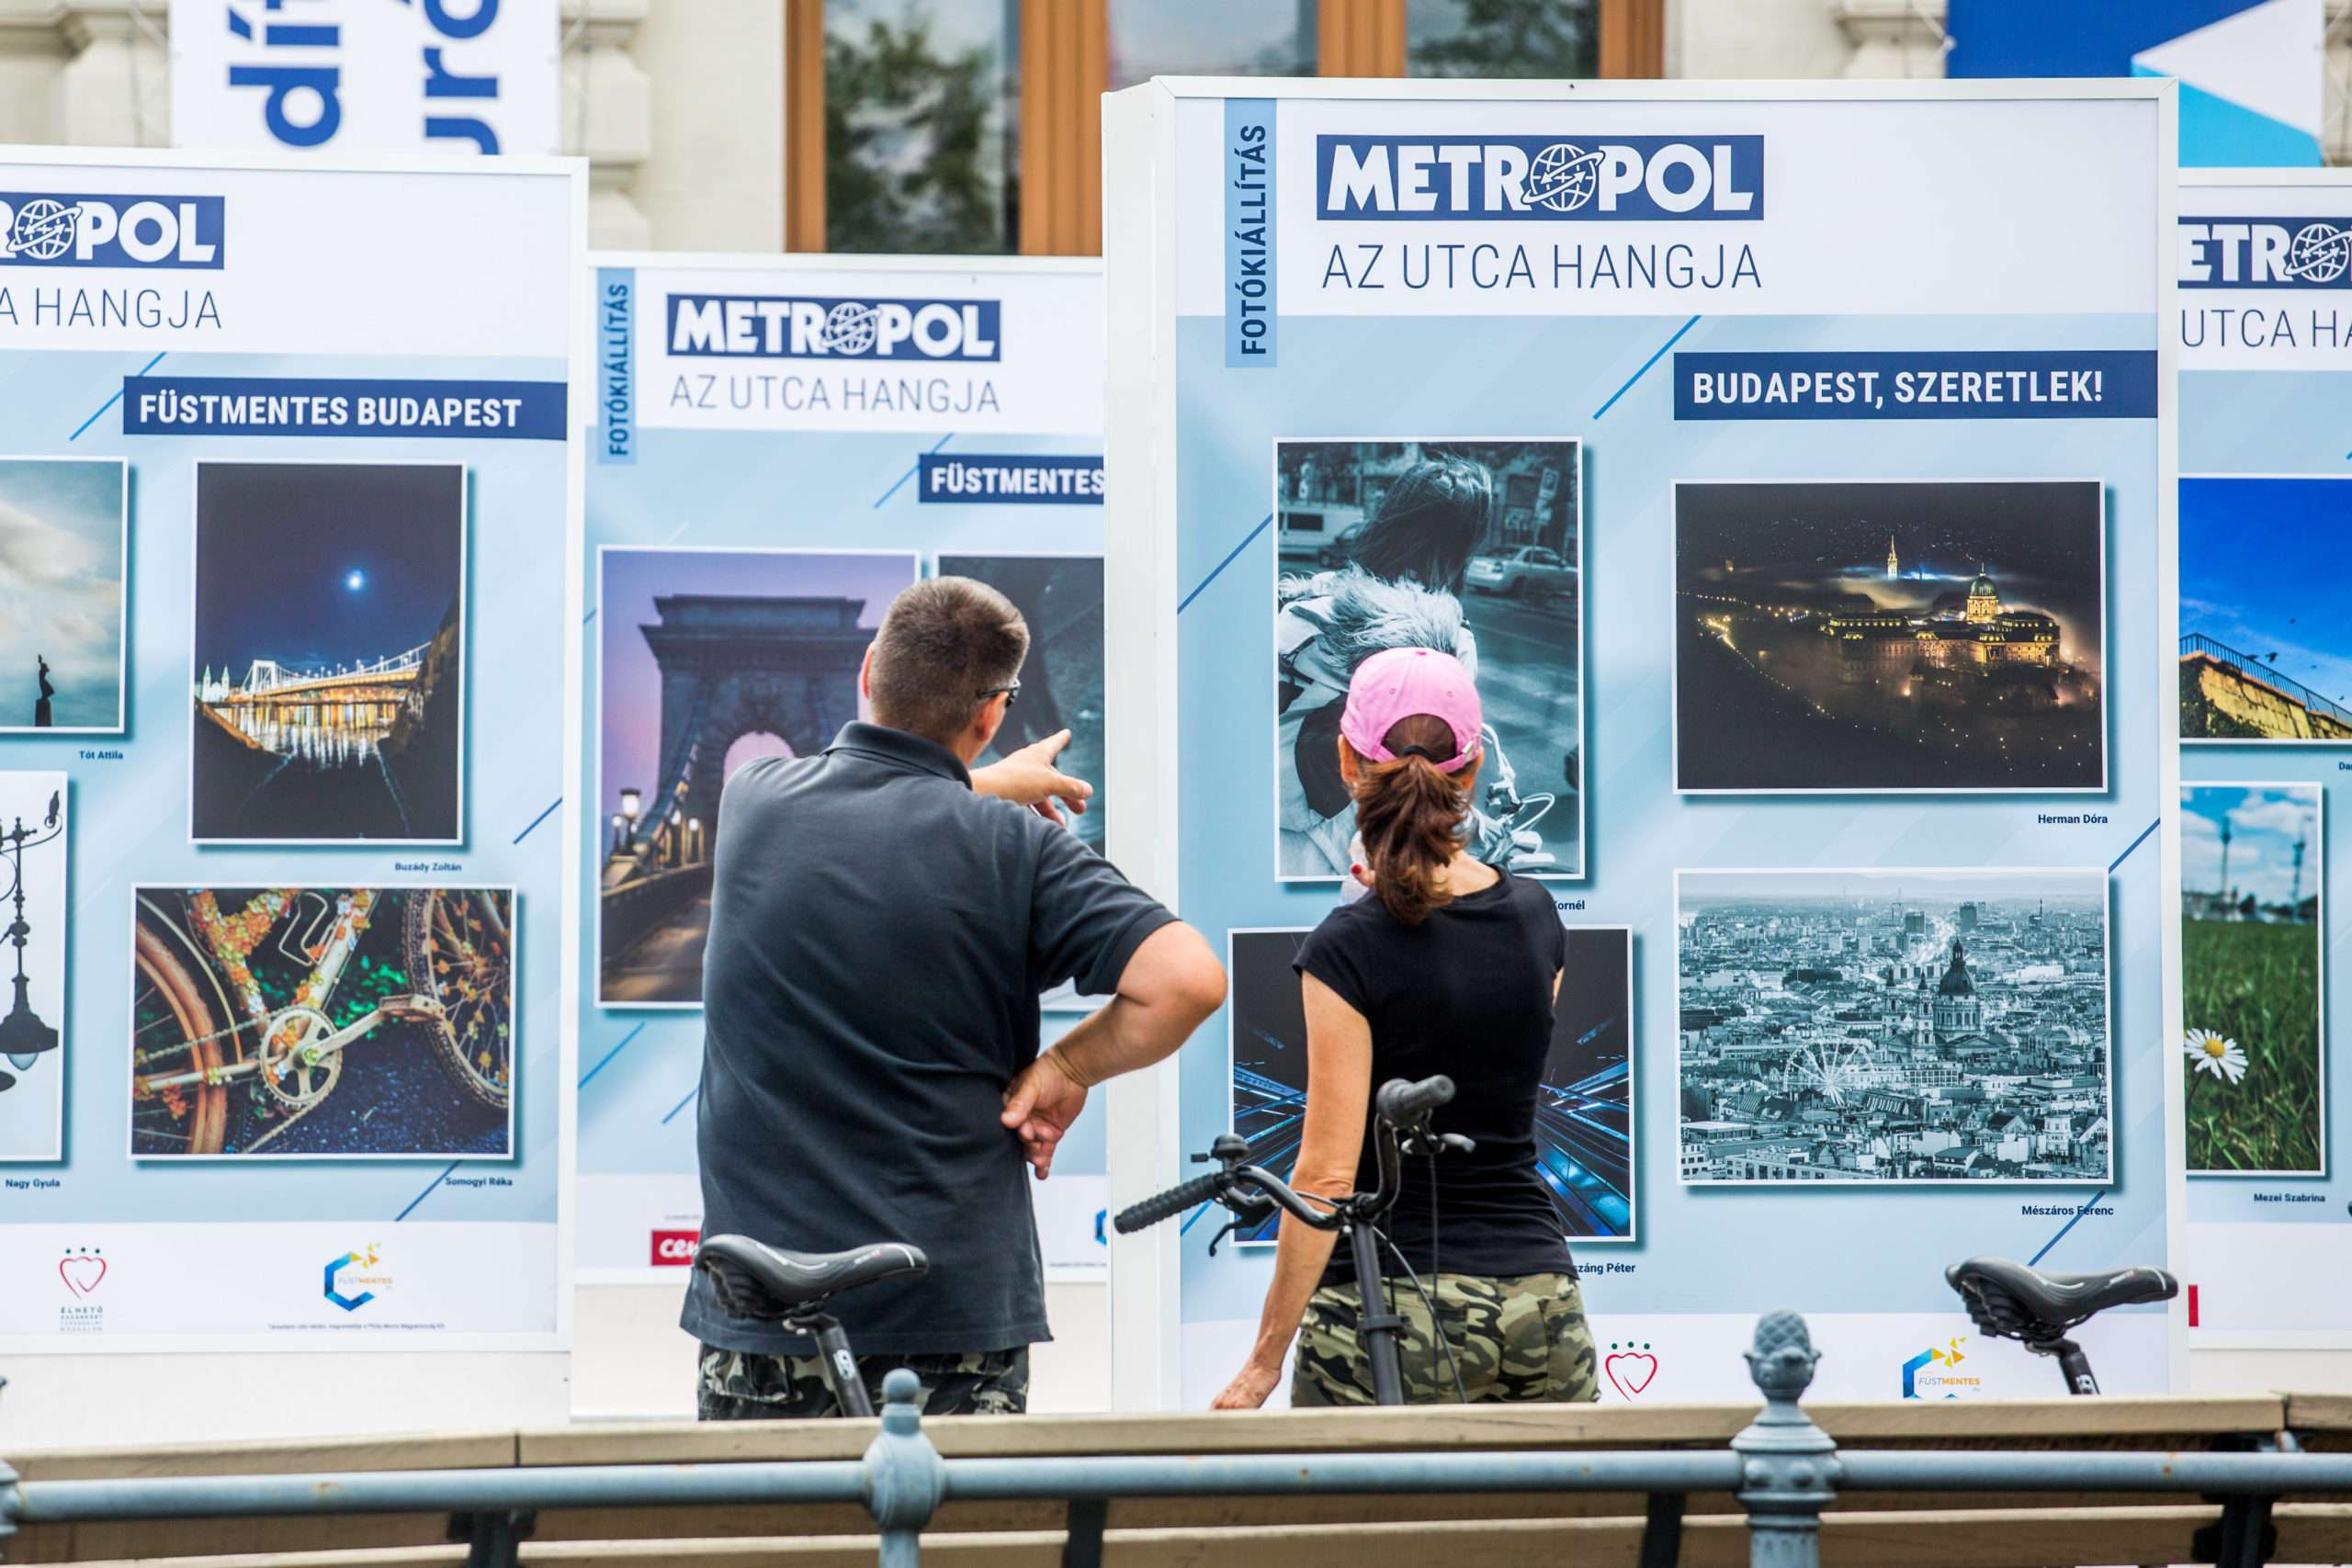 Fotó: Metropol